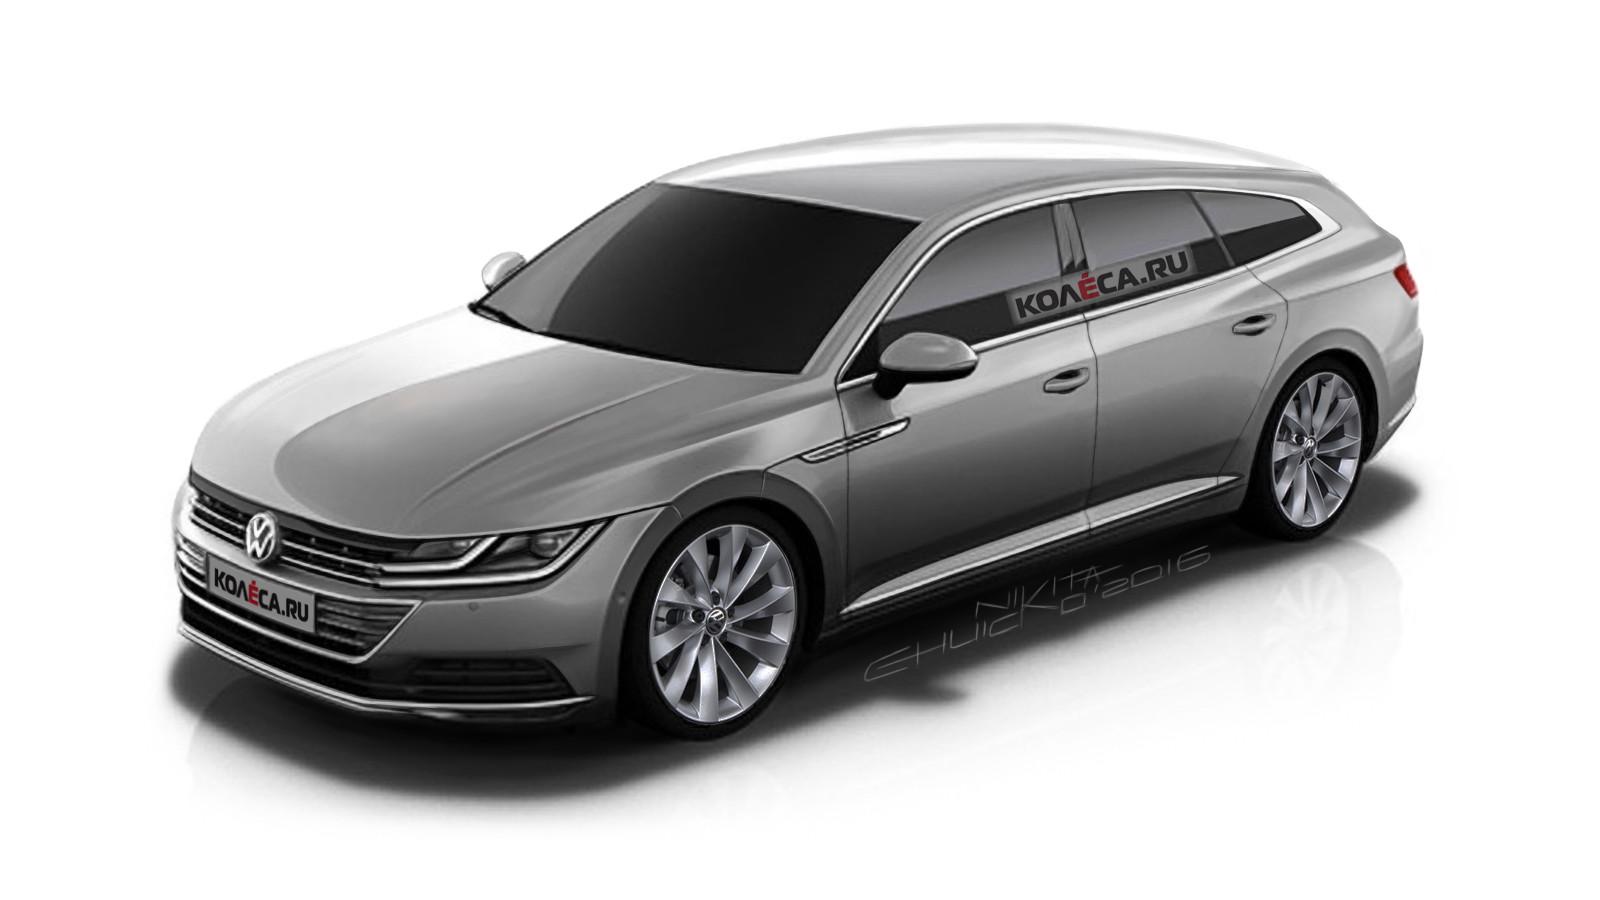 http://www.kolesa.ru/uploads/2016/12/Volkswagen-Arteon-Wagon-front1-1600x0-c-default.jpg